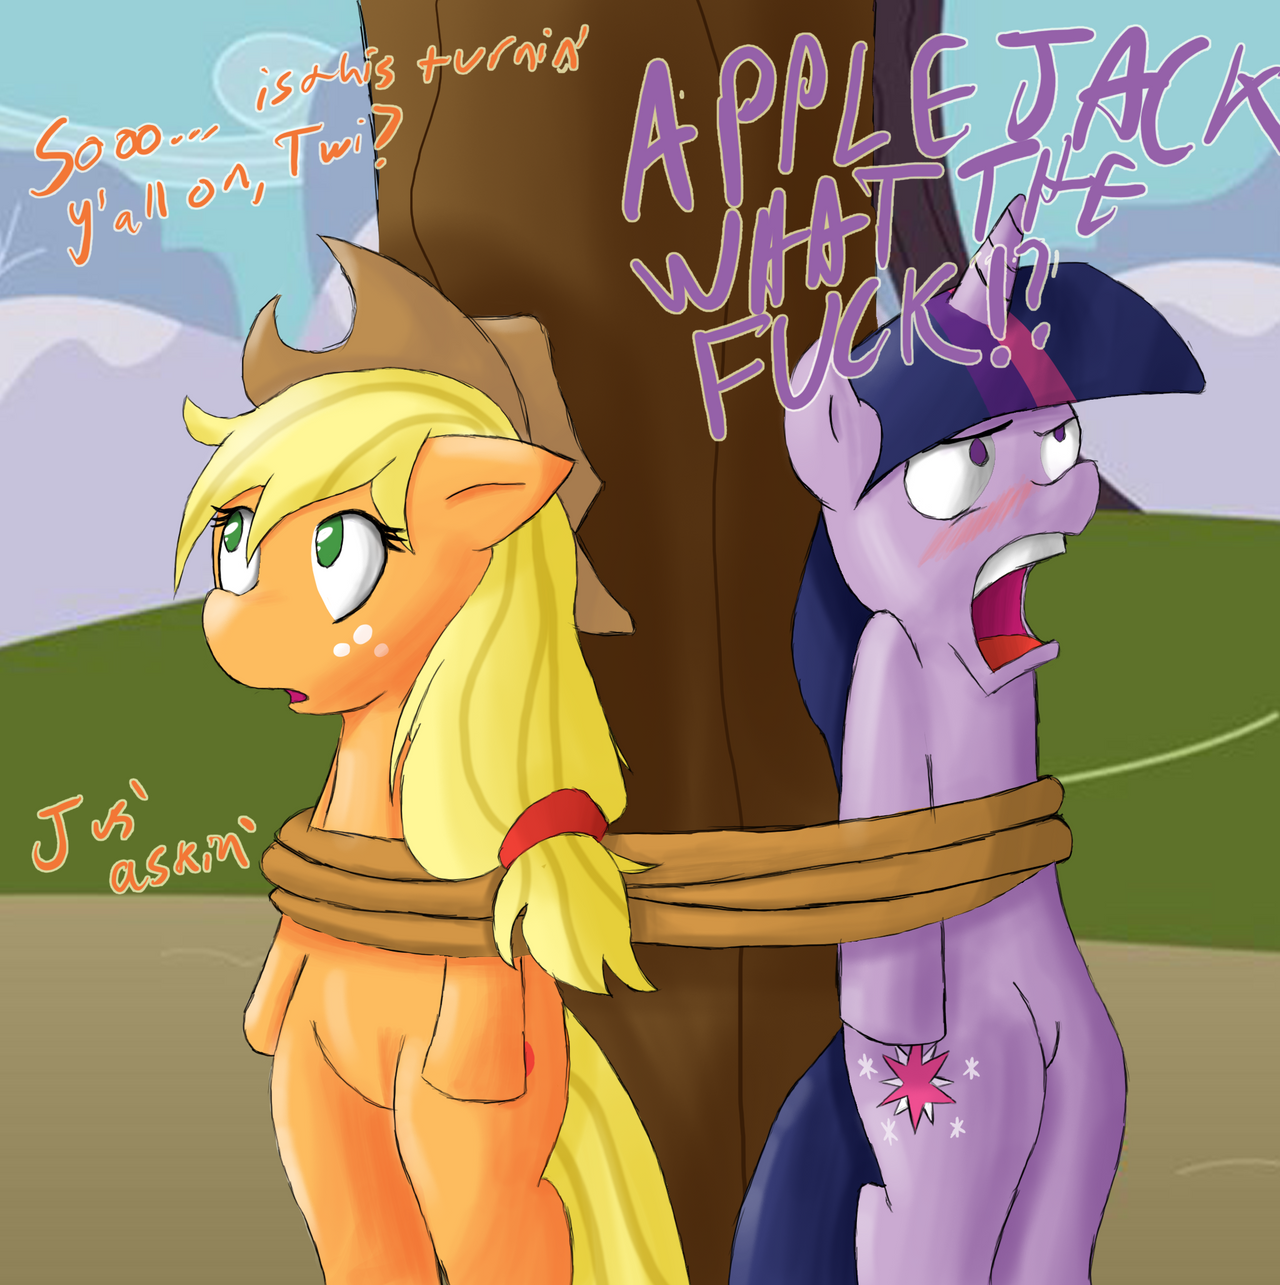 Applejack and Twilight by Untamezerg